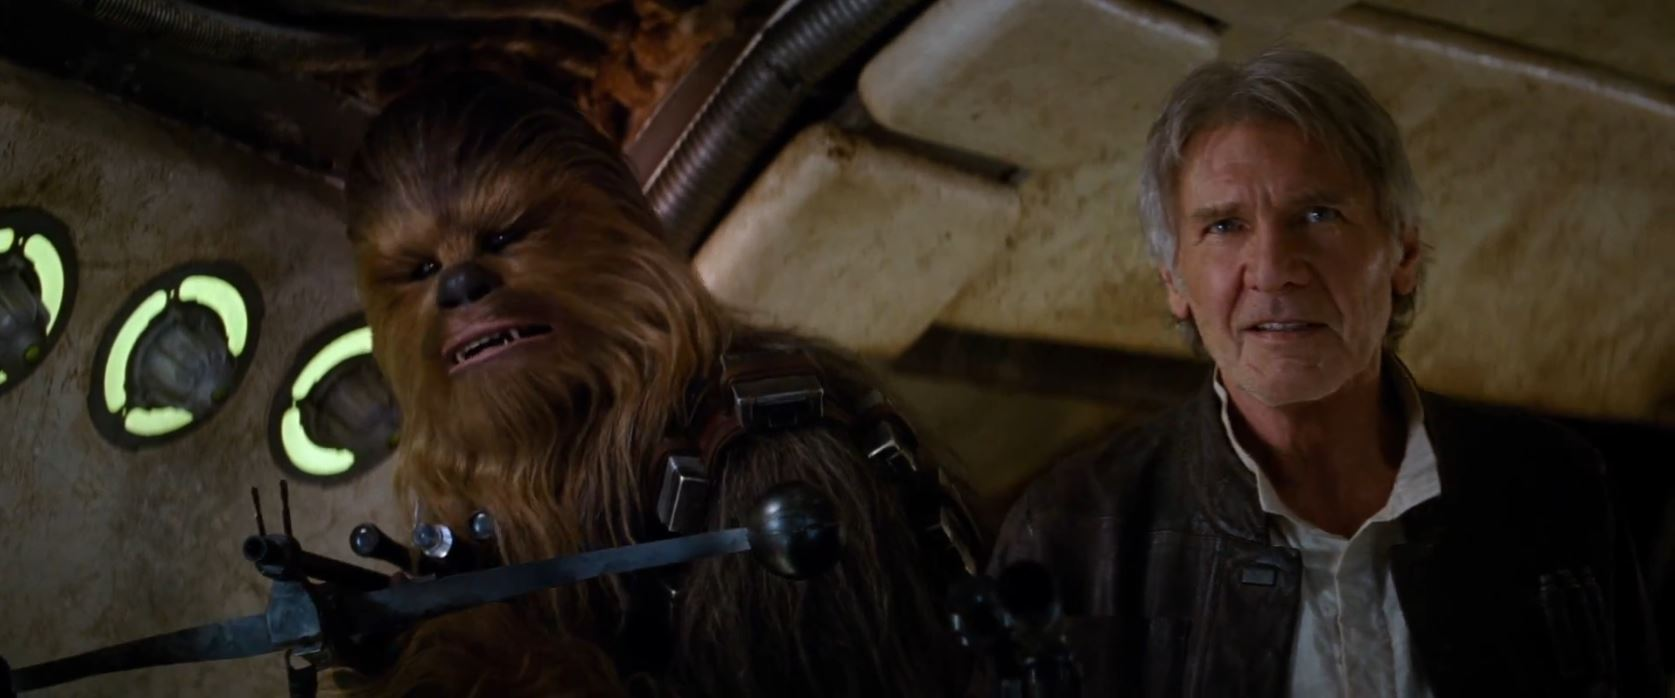 Han_Solo_Chewbacca_épisode_VII